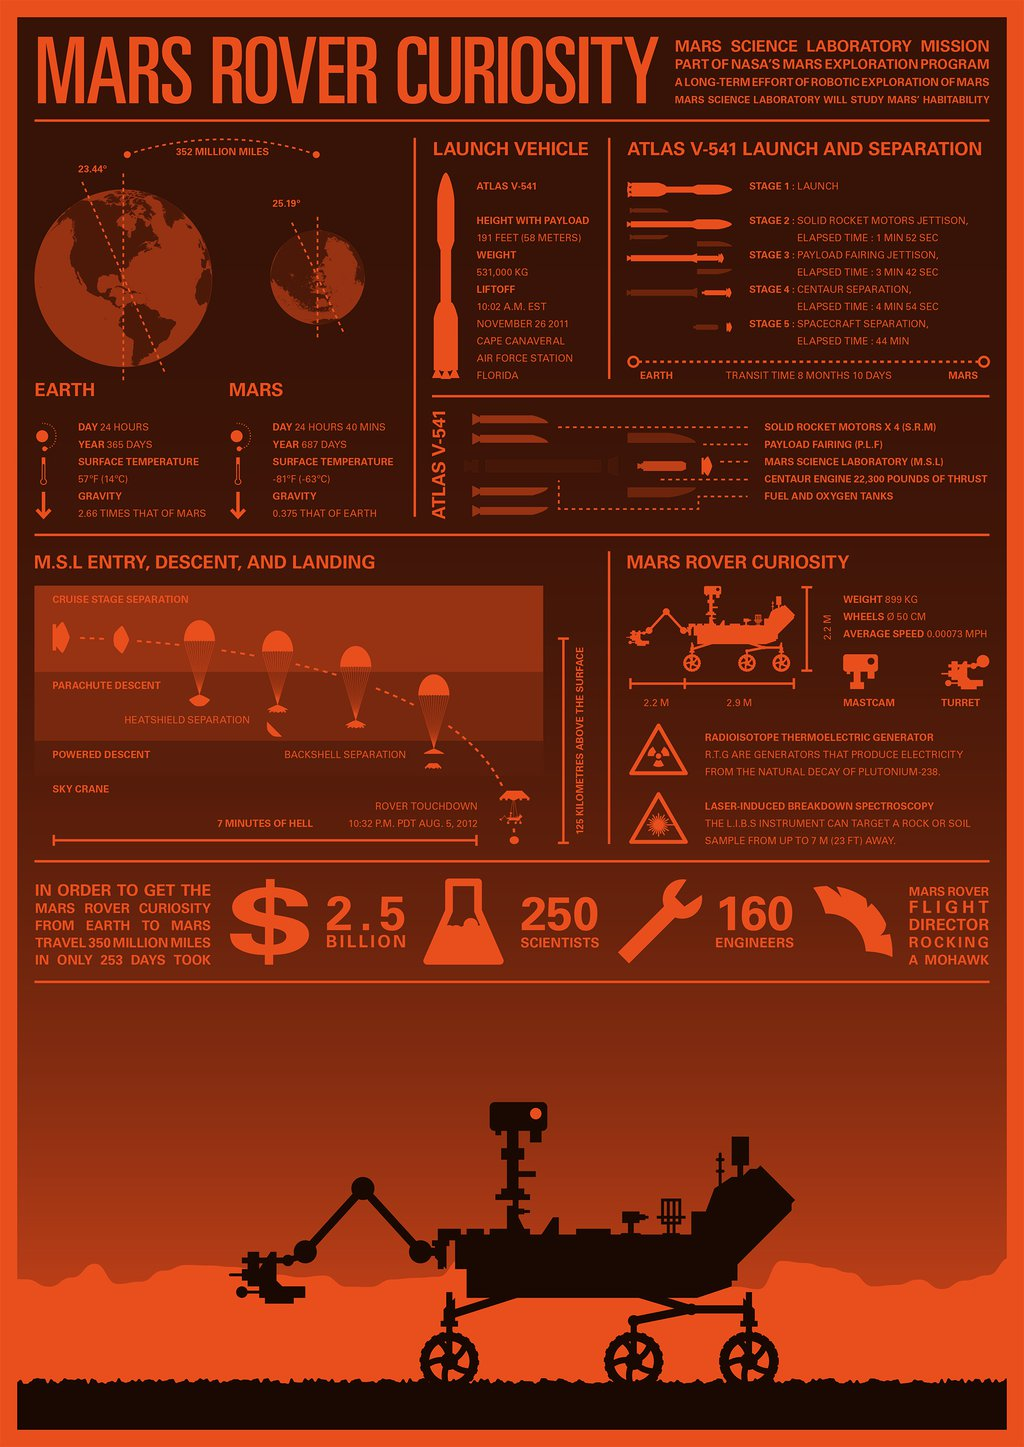 MARS ROVER CURIOSITY INFOGRAPHIC